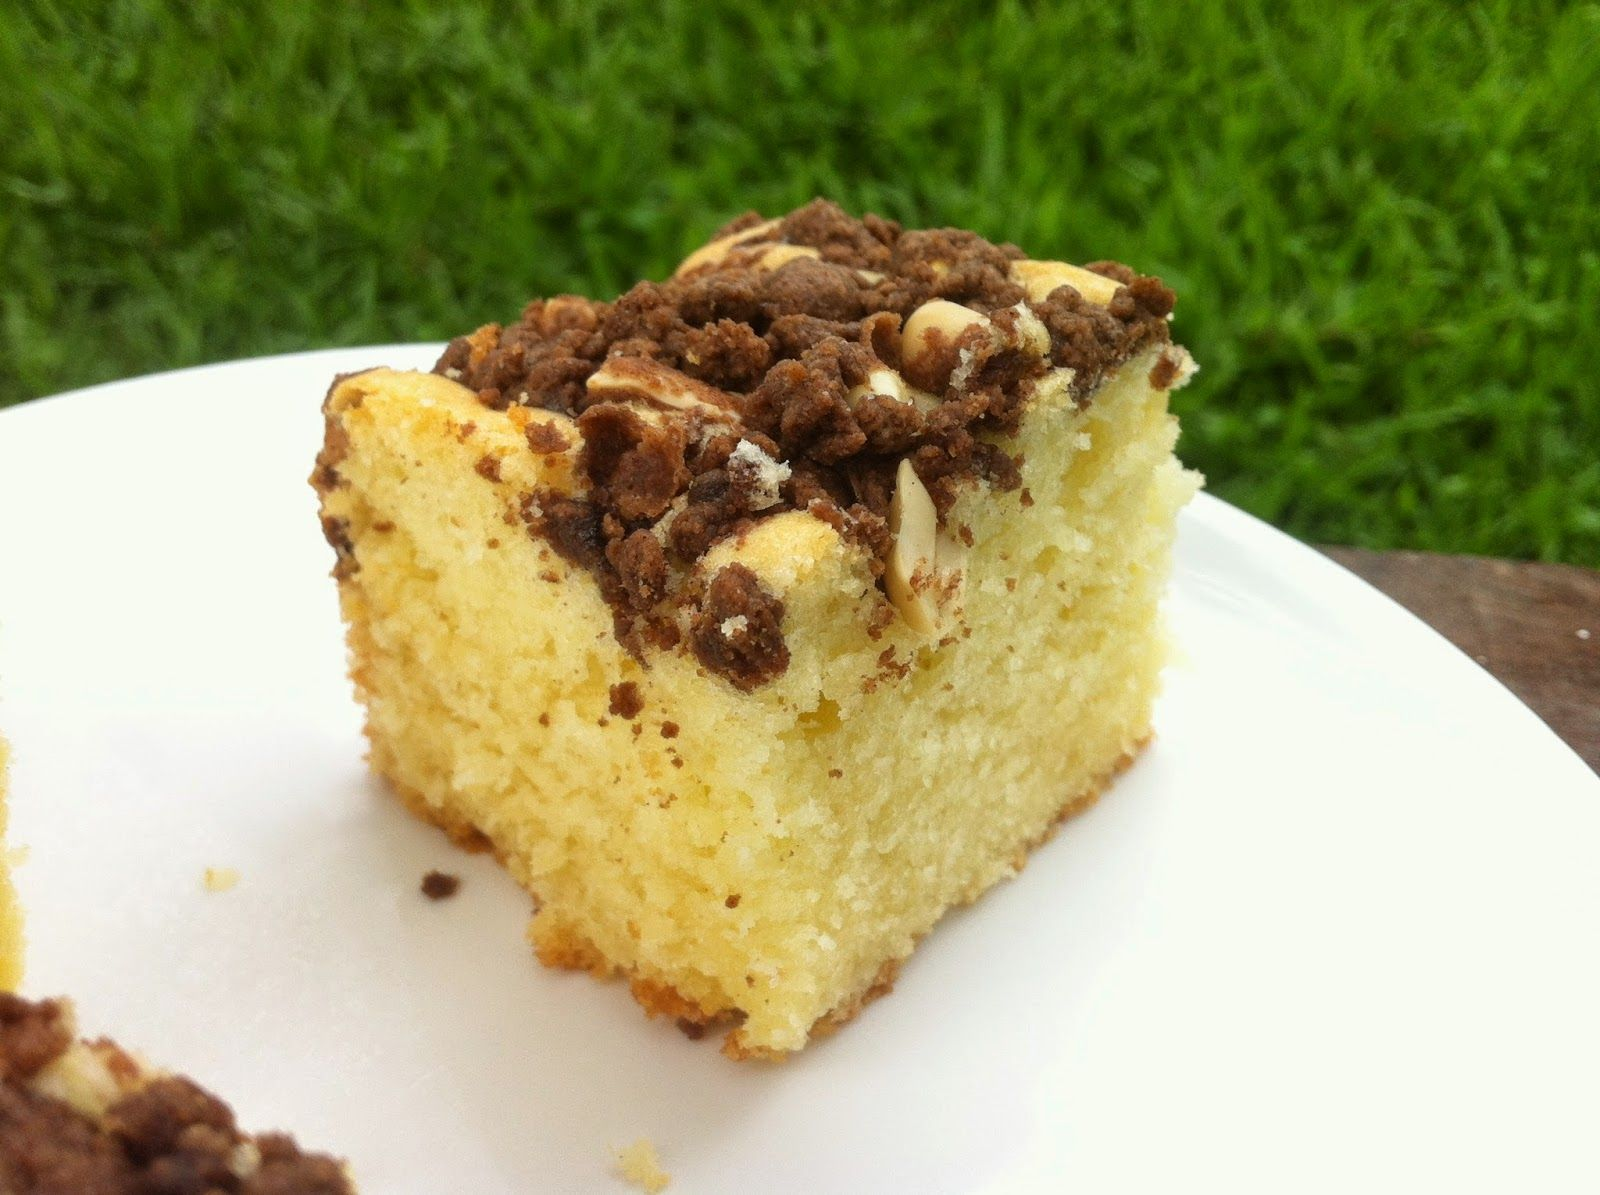 Chocorango: Coffee Cake Perfeito